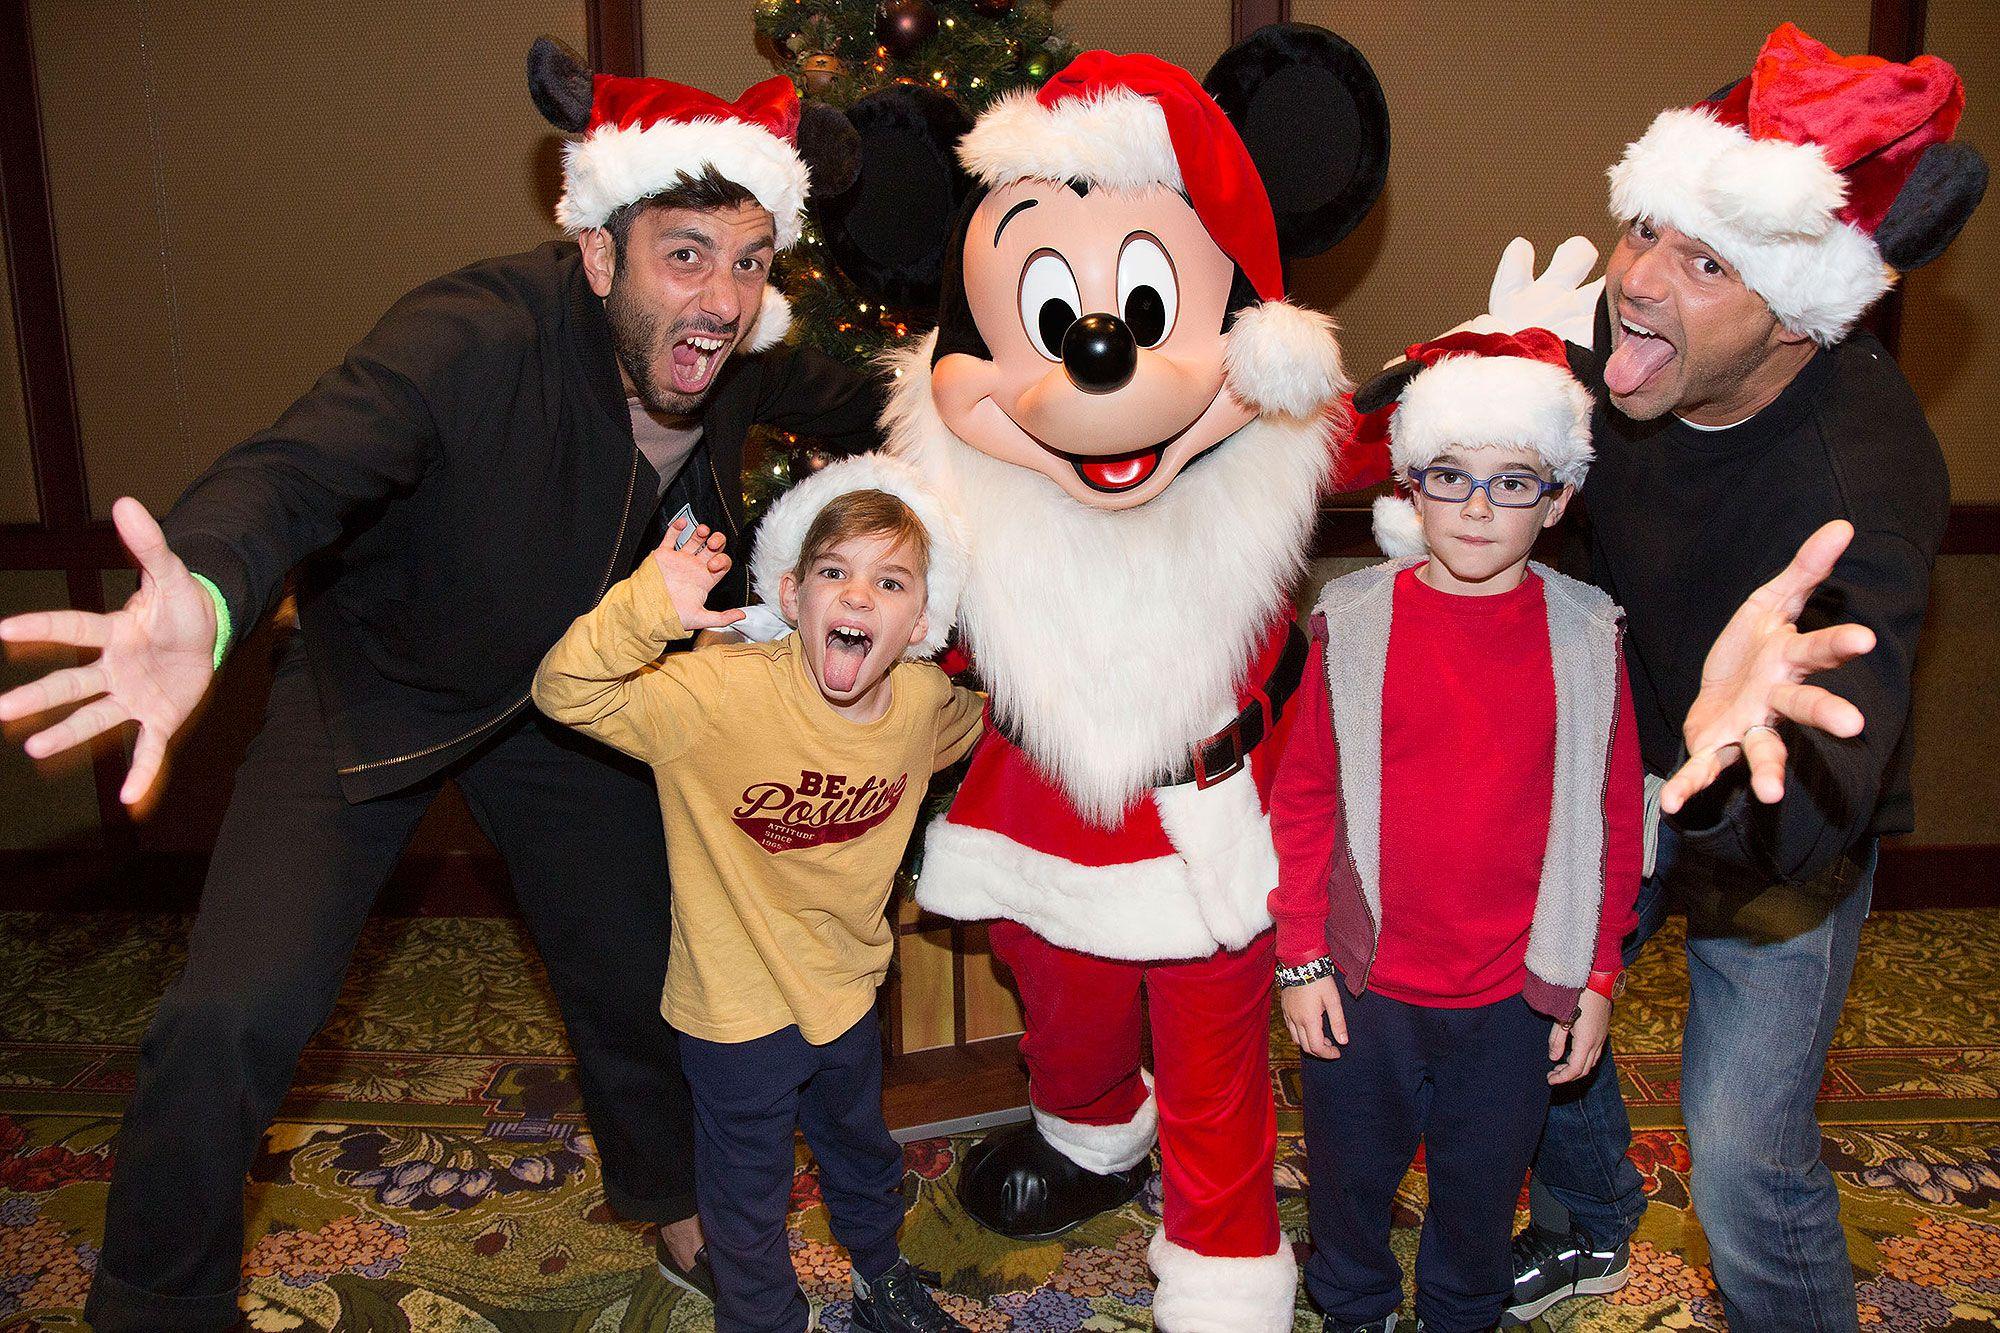 Ricky Martin and family celebrating Christmas at Disneyland